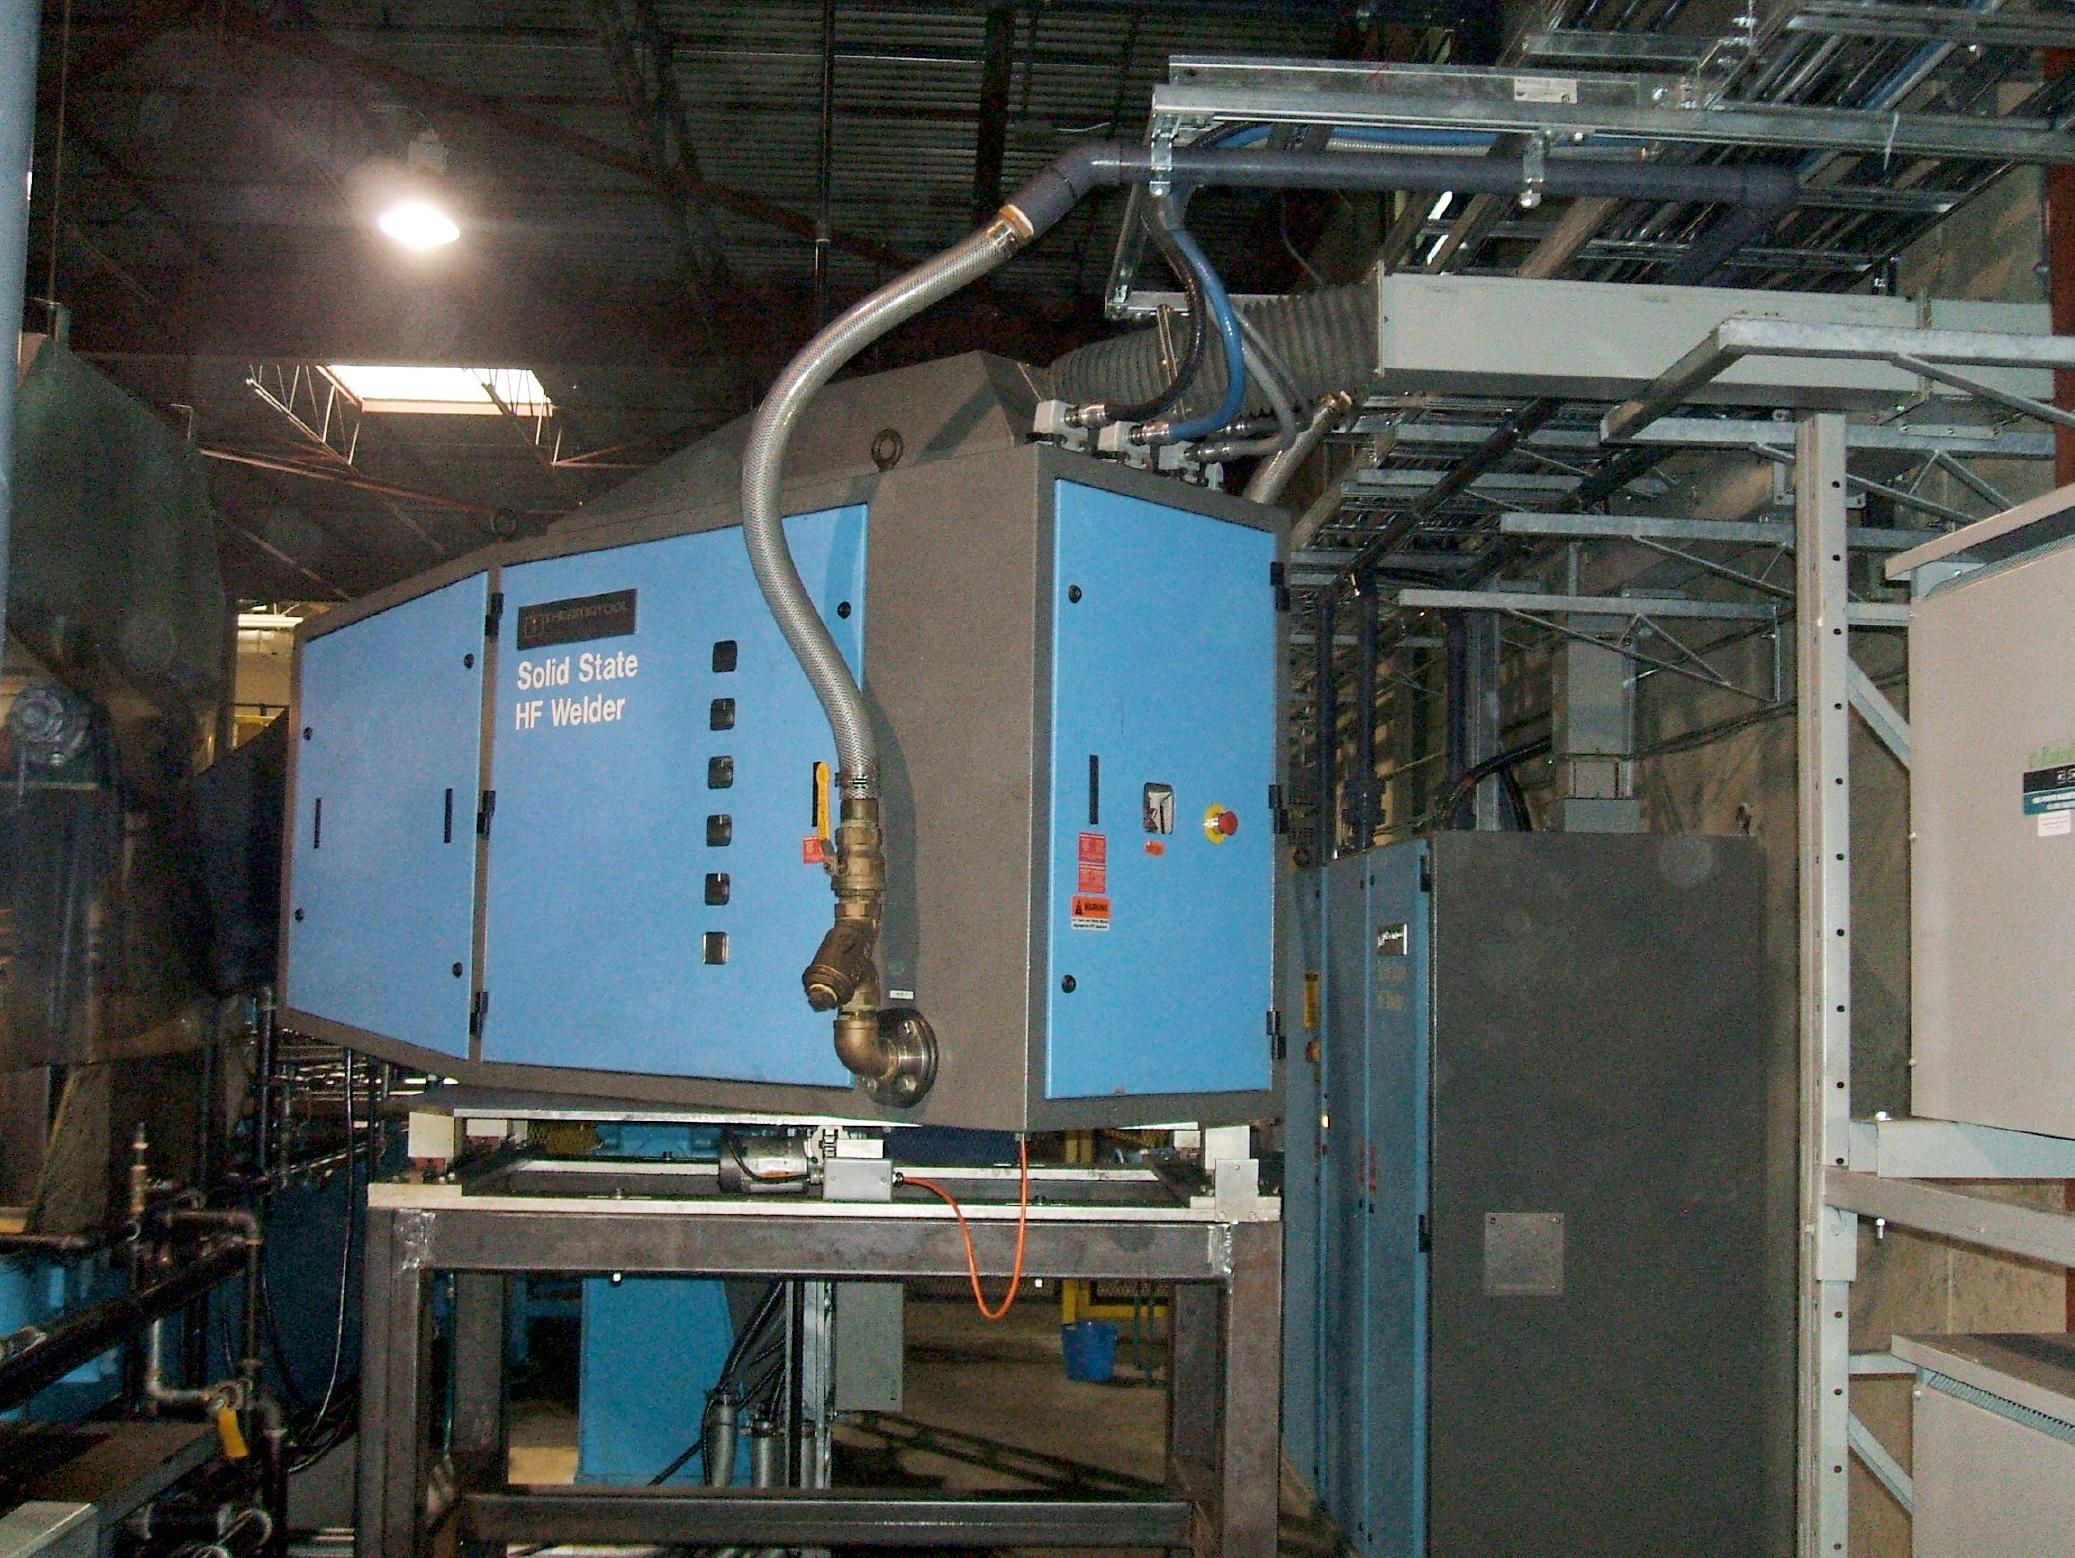 Thermatool CFI HF Welder Installation DSCF2442